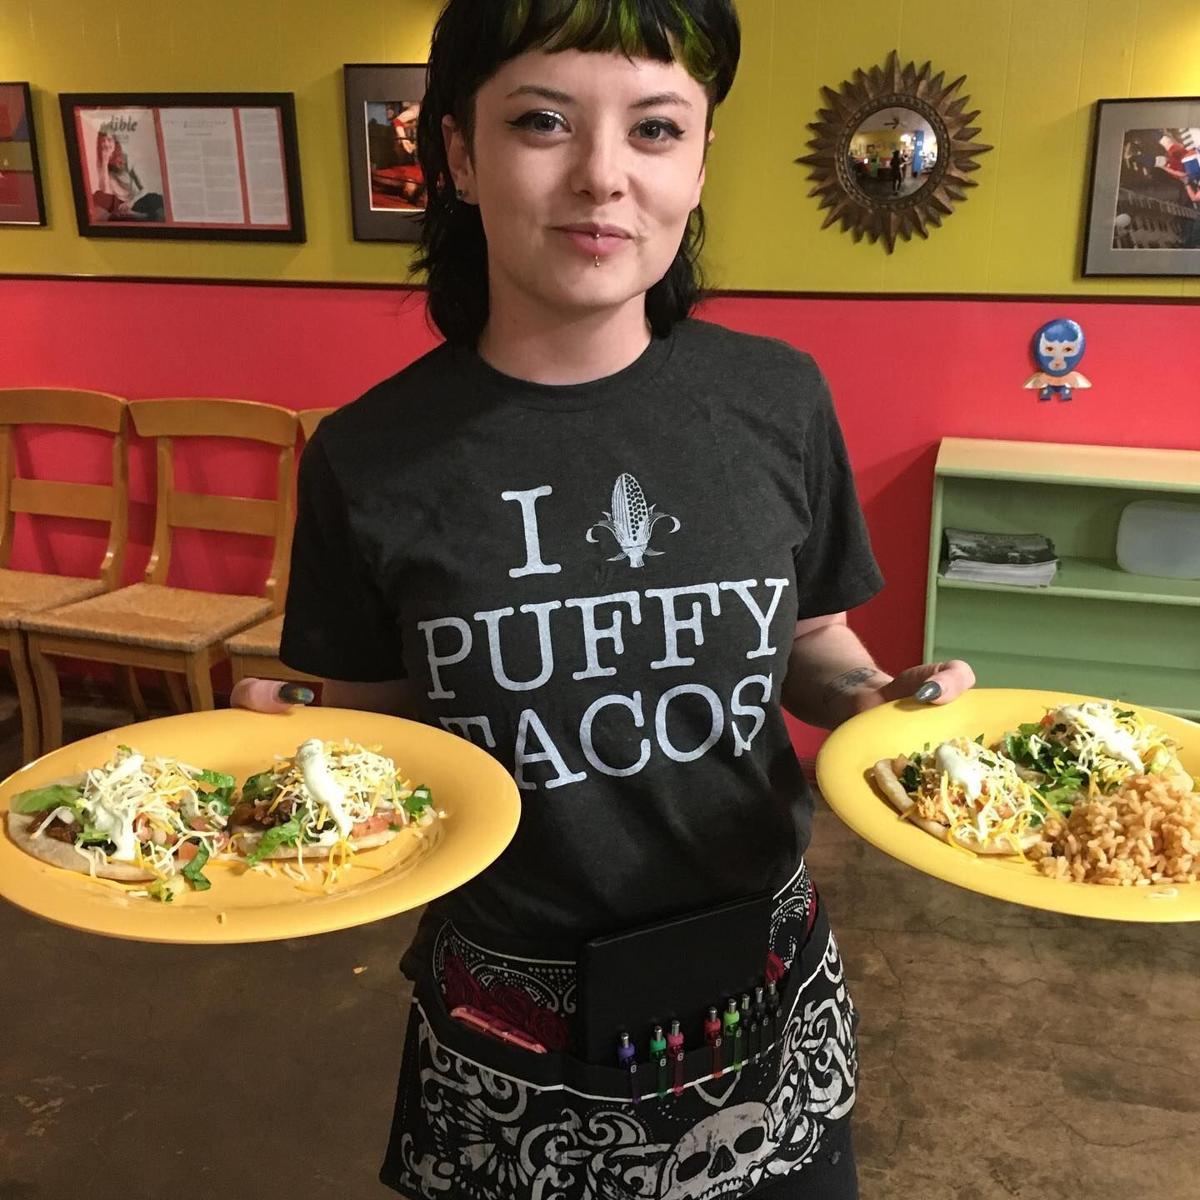 elote puffy tacos.jpg